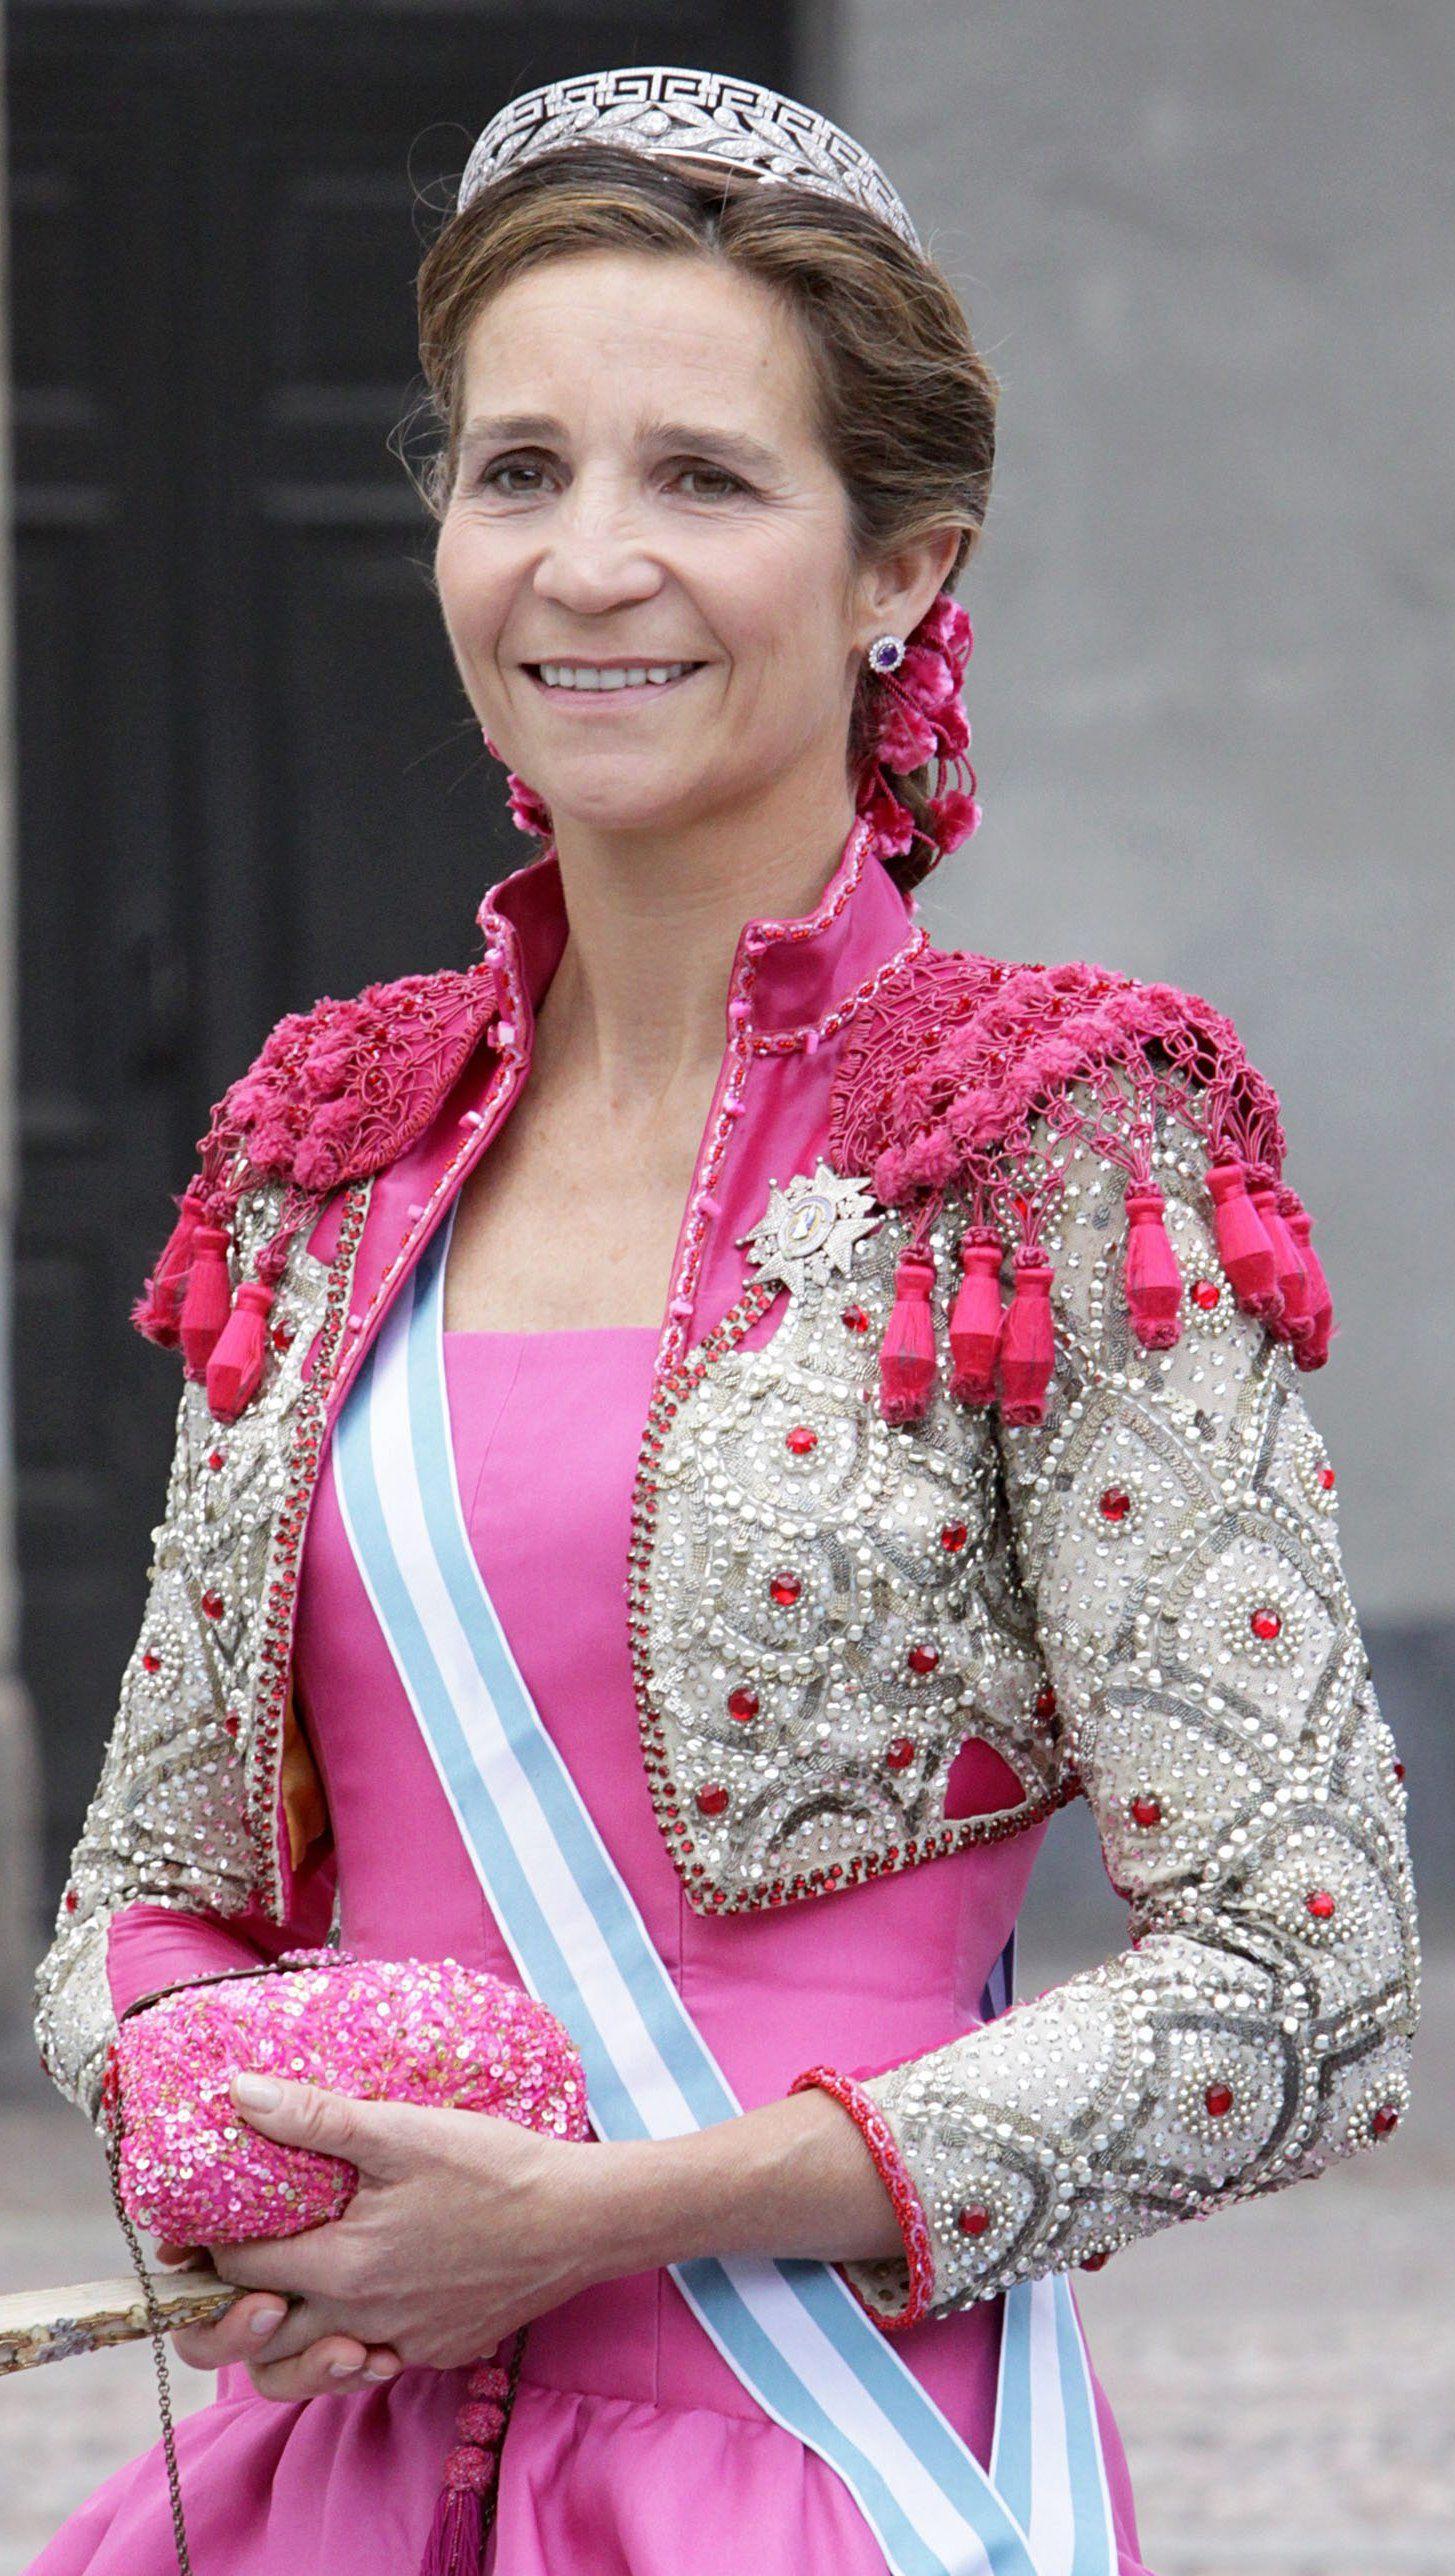 Her Royal Highness Infanta Elena of Spain, Duchess of Lugo. Infanta ...